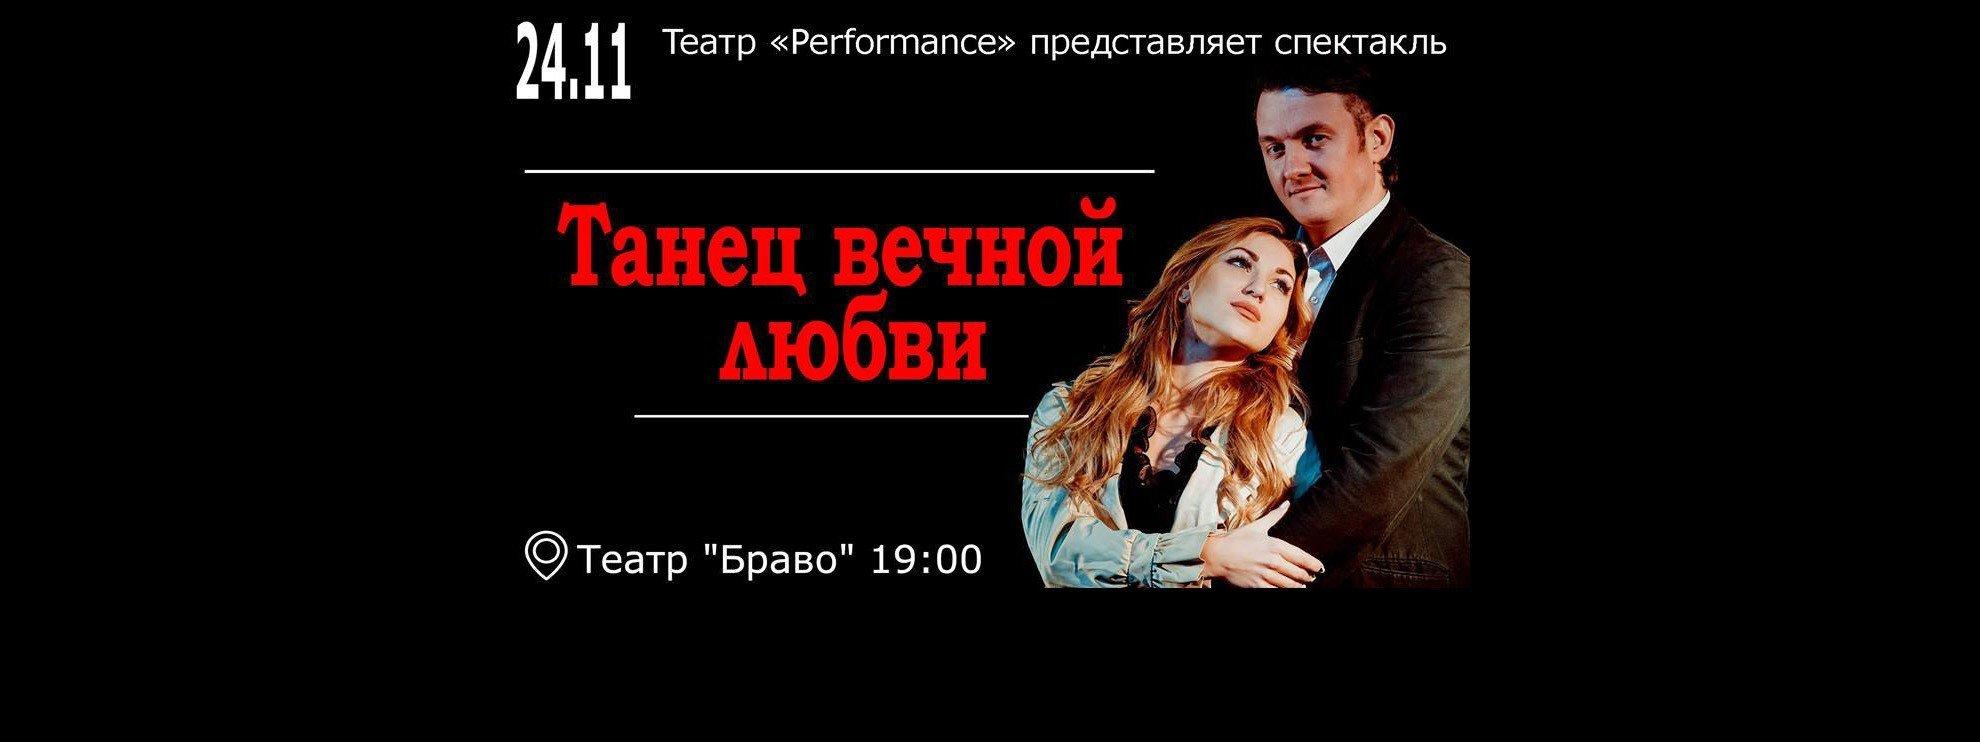 виконавець Театр Performance (Перфоманс)